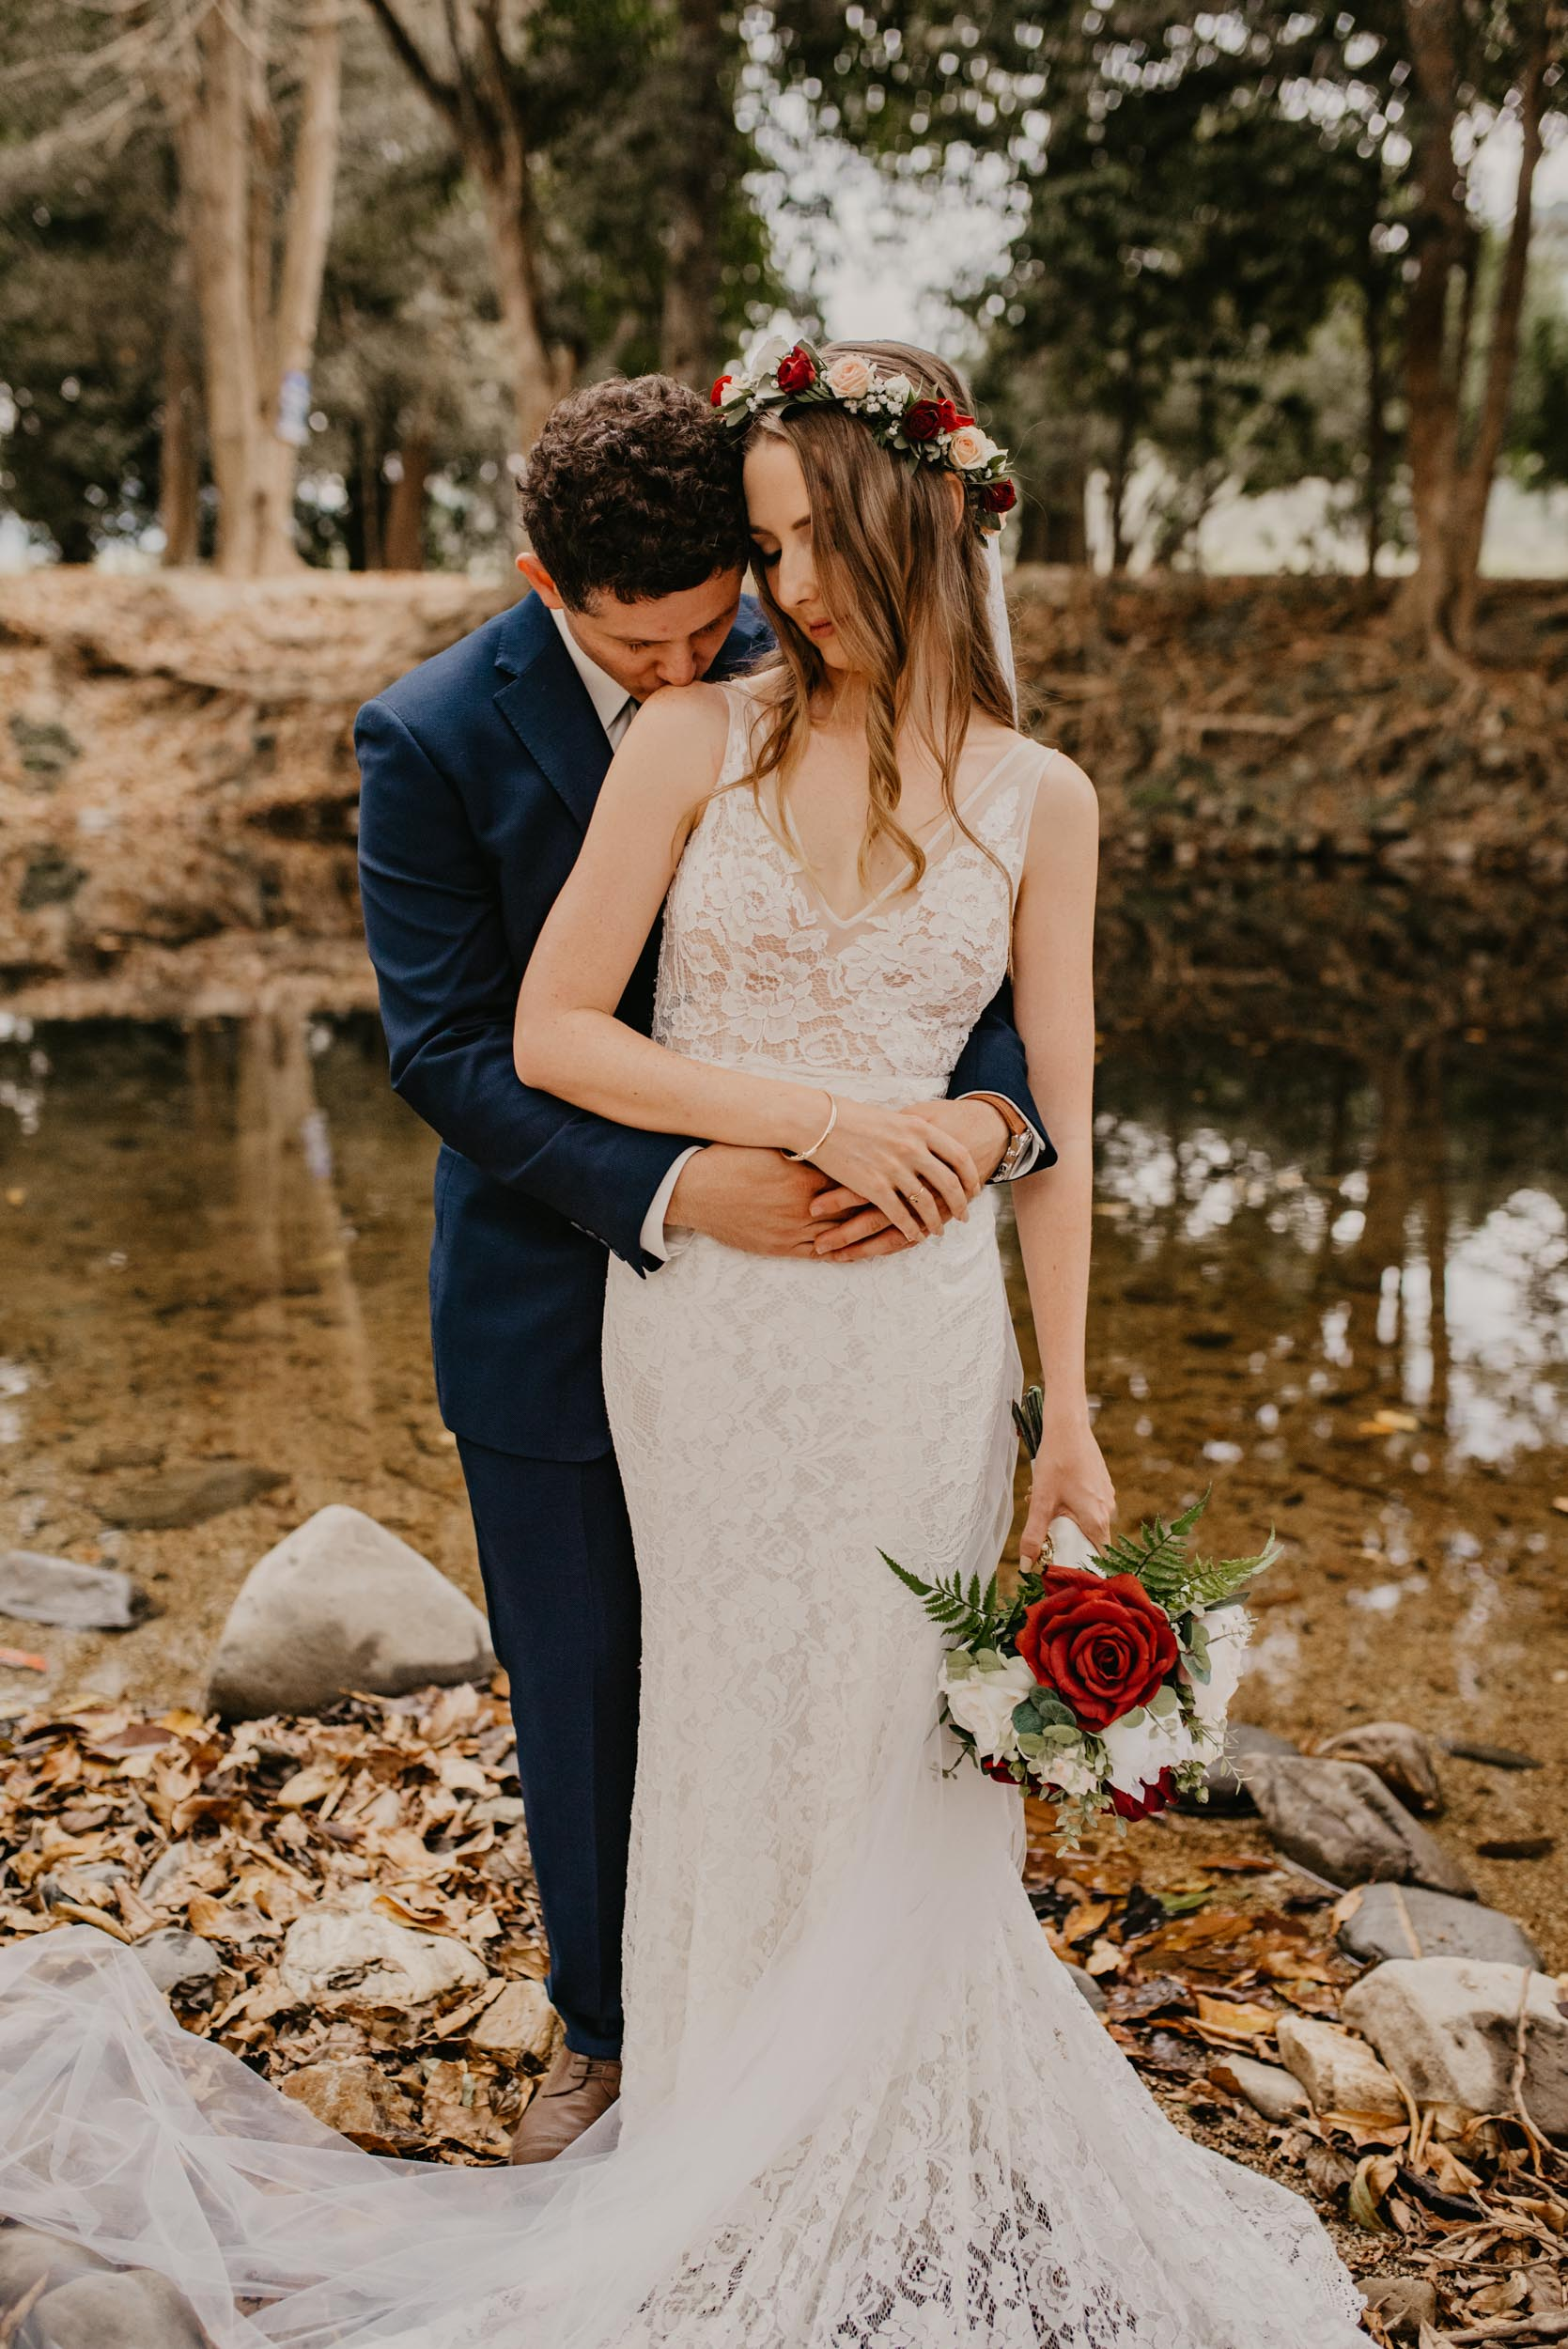 The Raw Photographer - Cairns Wedding Photographer - Laloli - Cairns Garden Ceremony - Cane Fields Photo Shoot-50.jpg